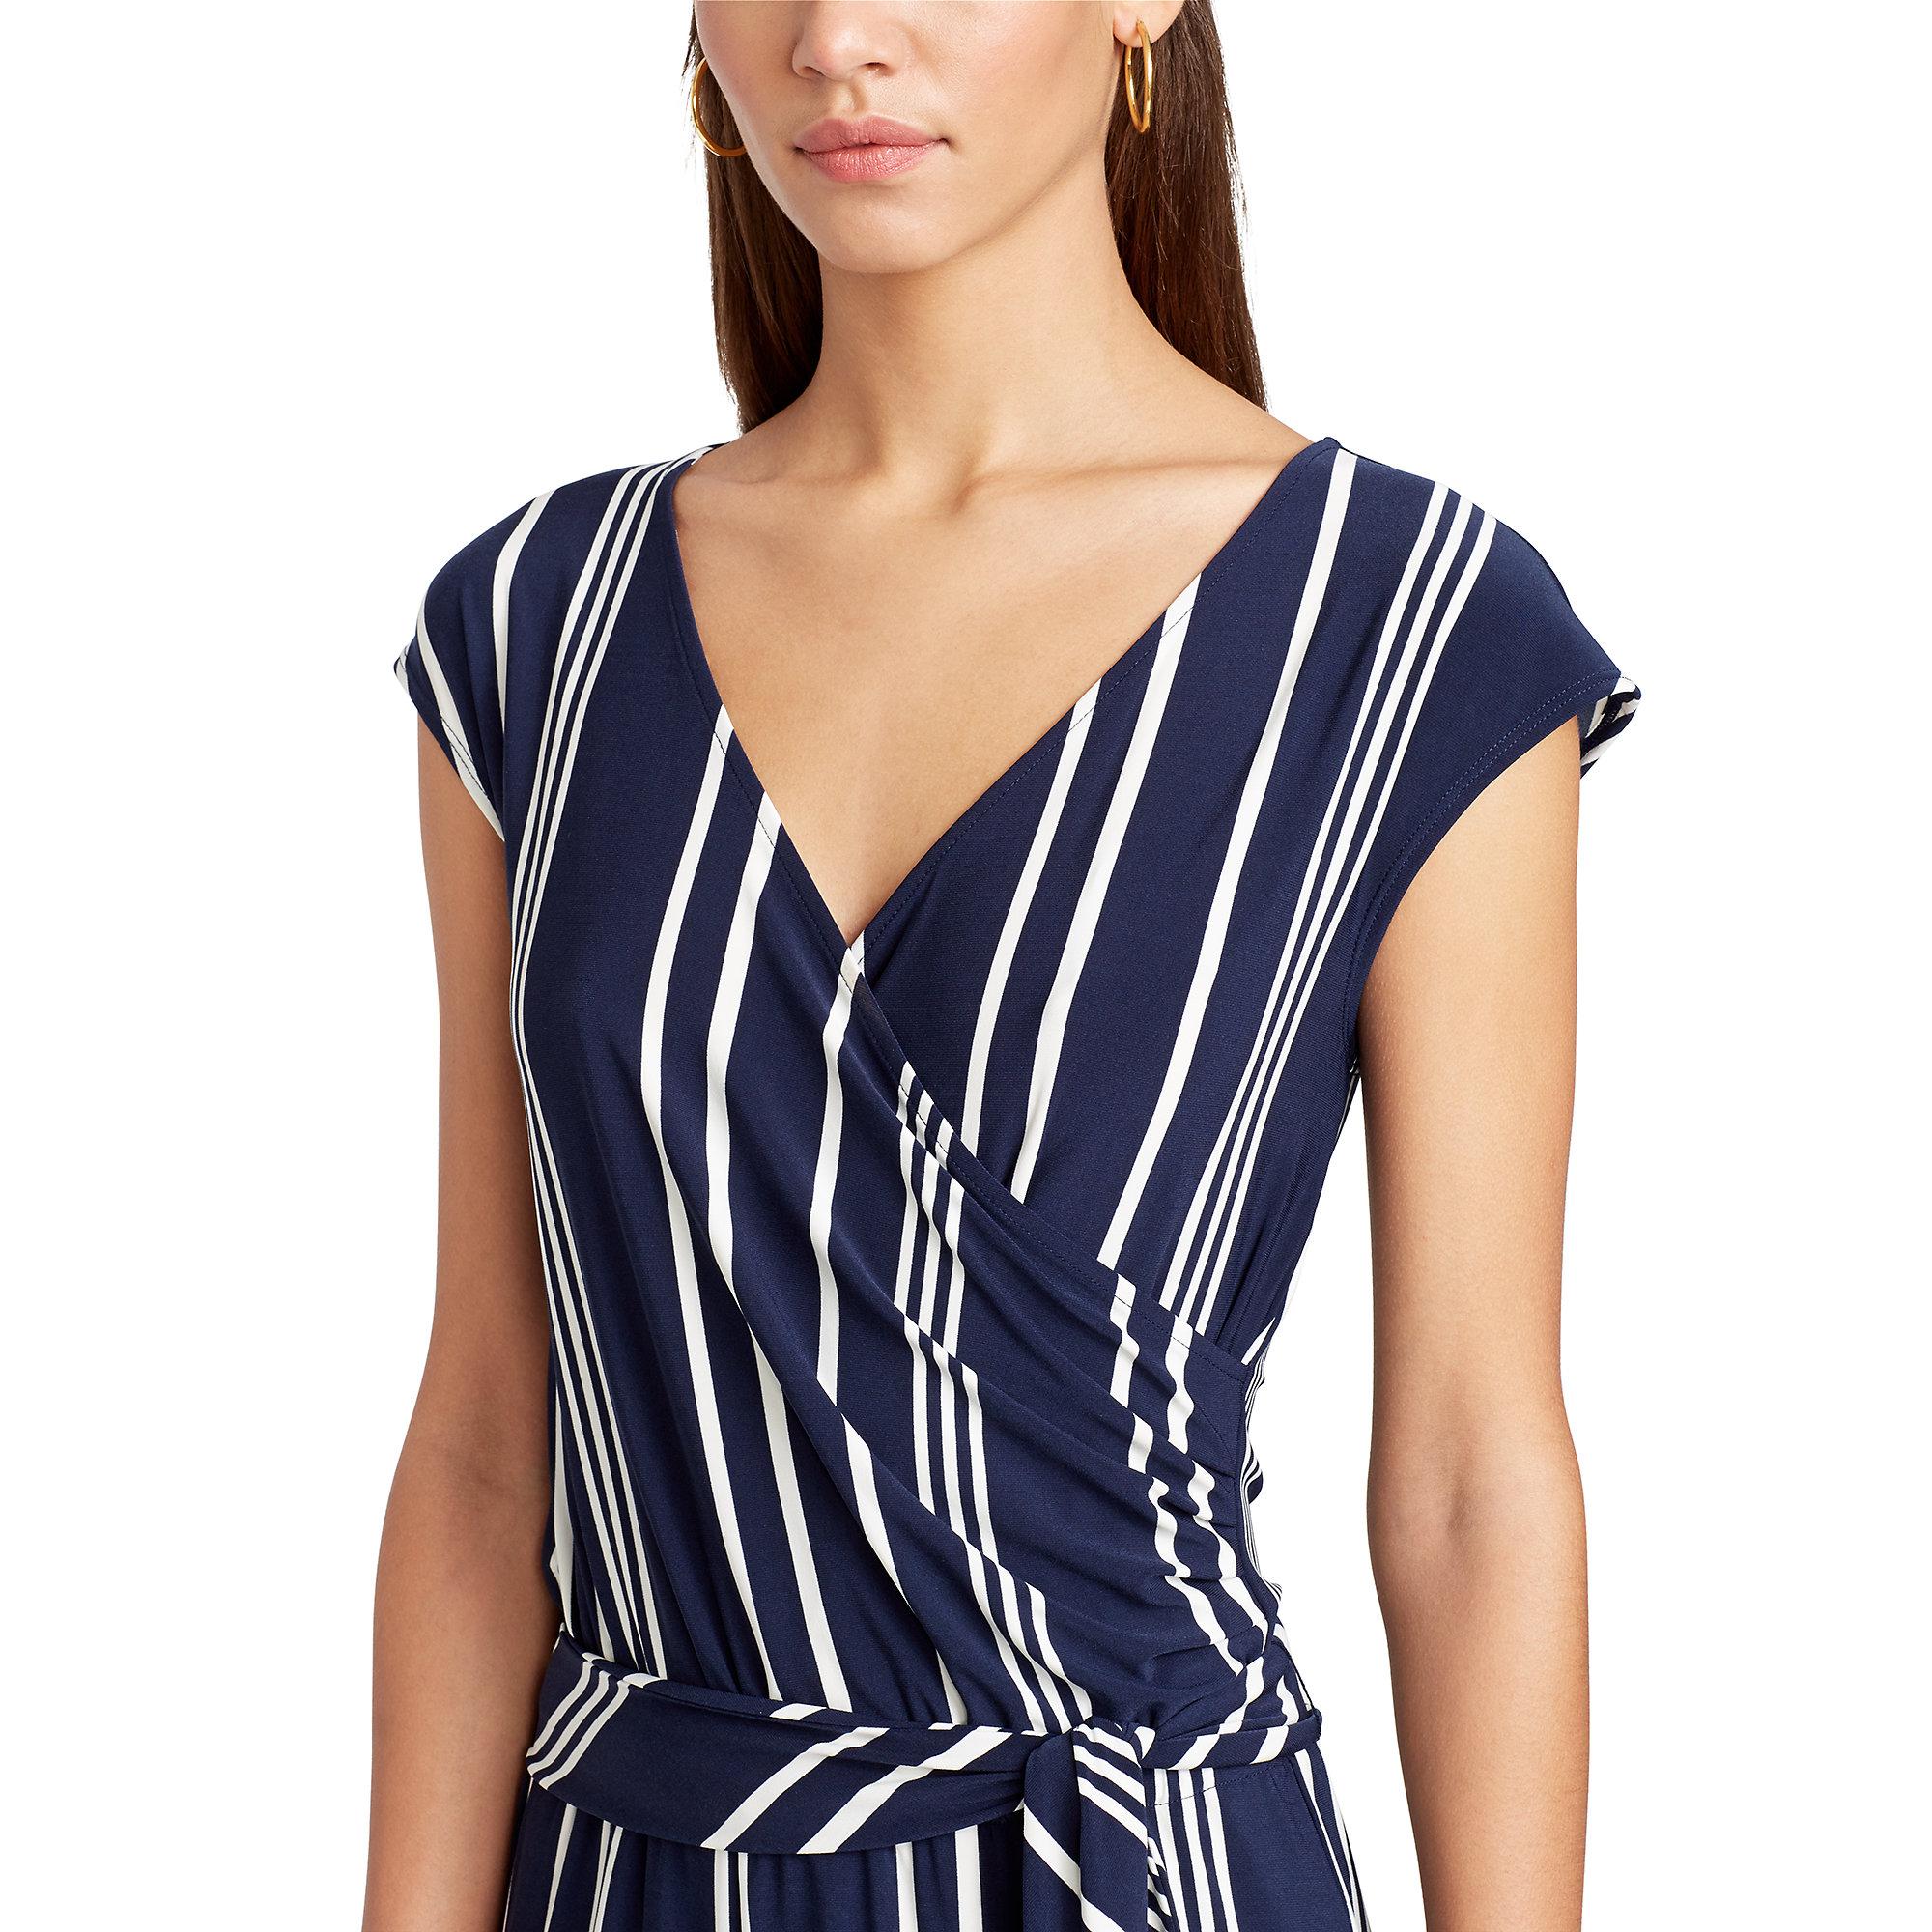 4ade9adaf034 Lyst - Ralph Lauren Striped Surplice Jumpsuit in Blue